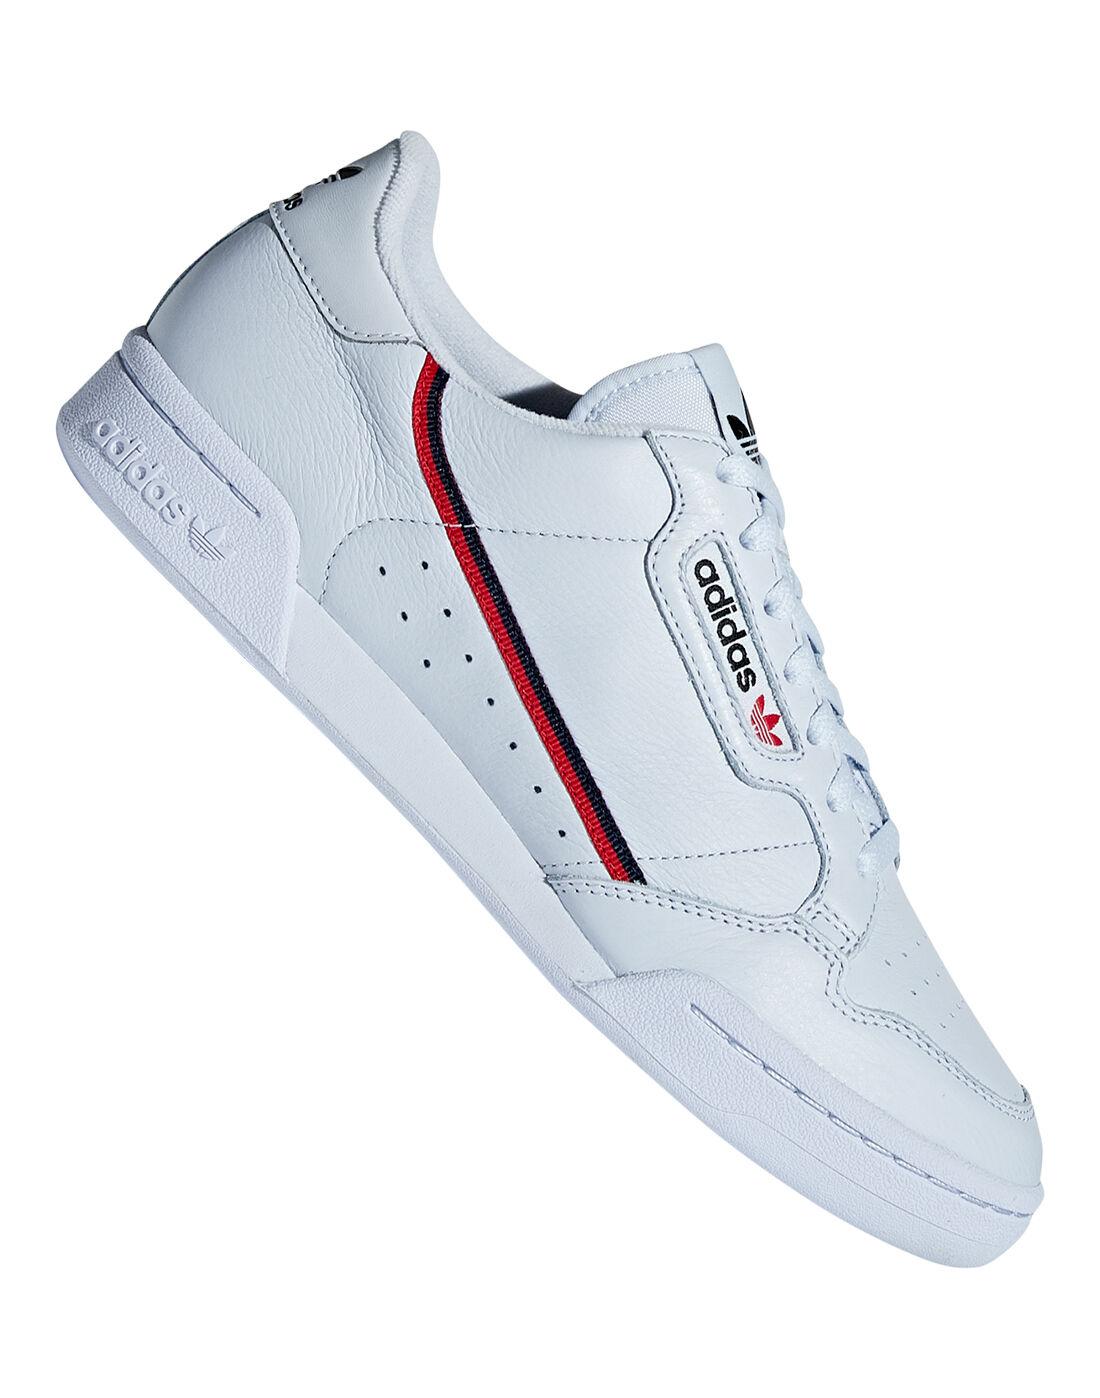 adidas Originals Life Sports Style Sports Life 7ba849